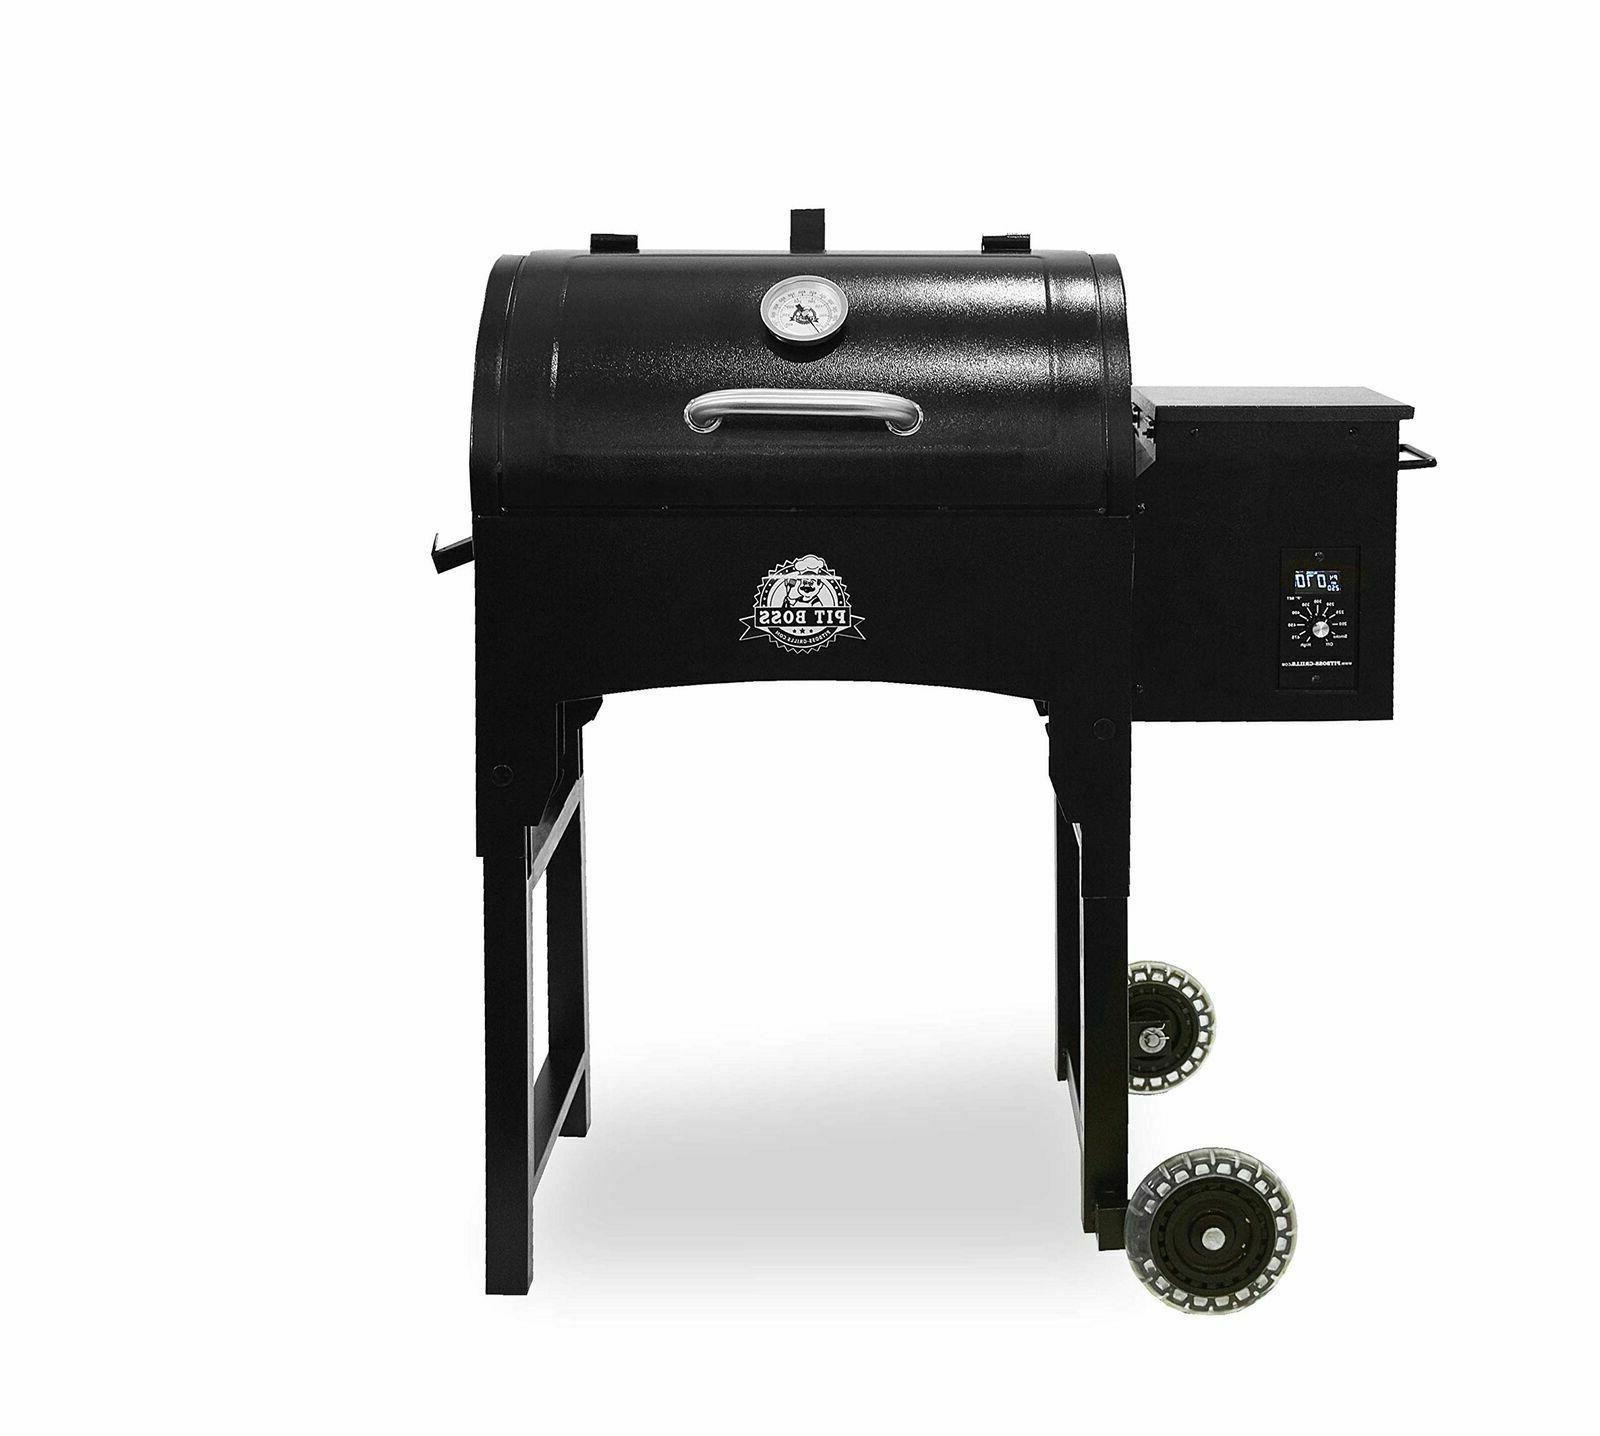 pb340 portable wood folding legs pellet grill